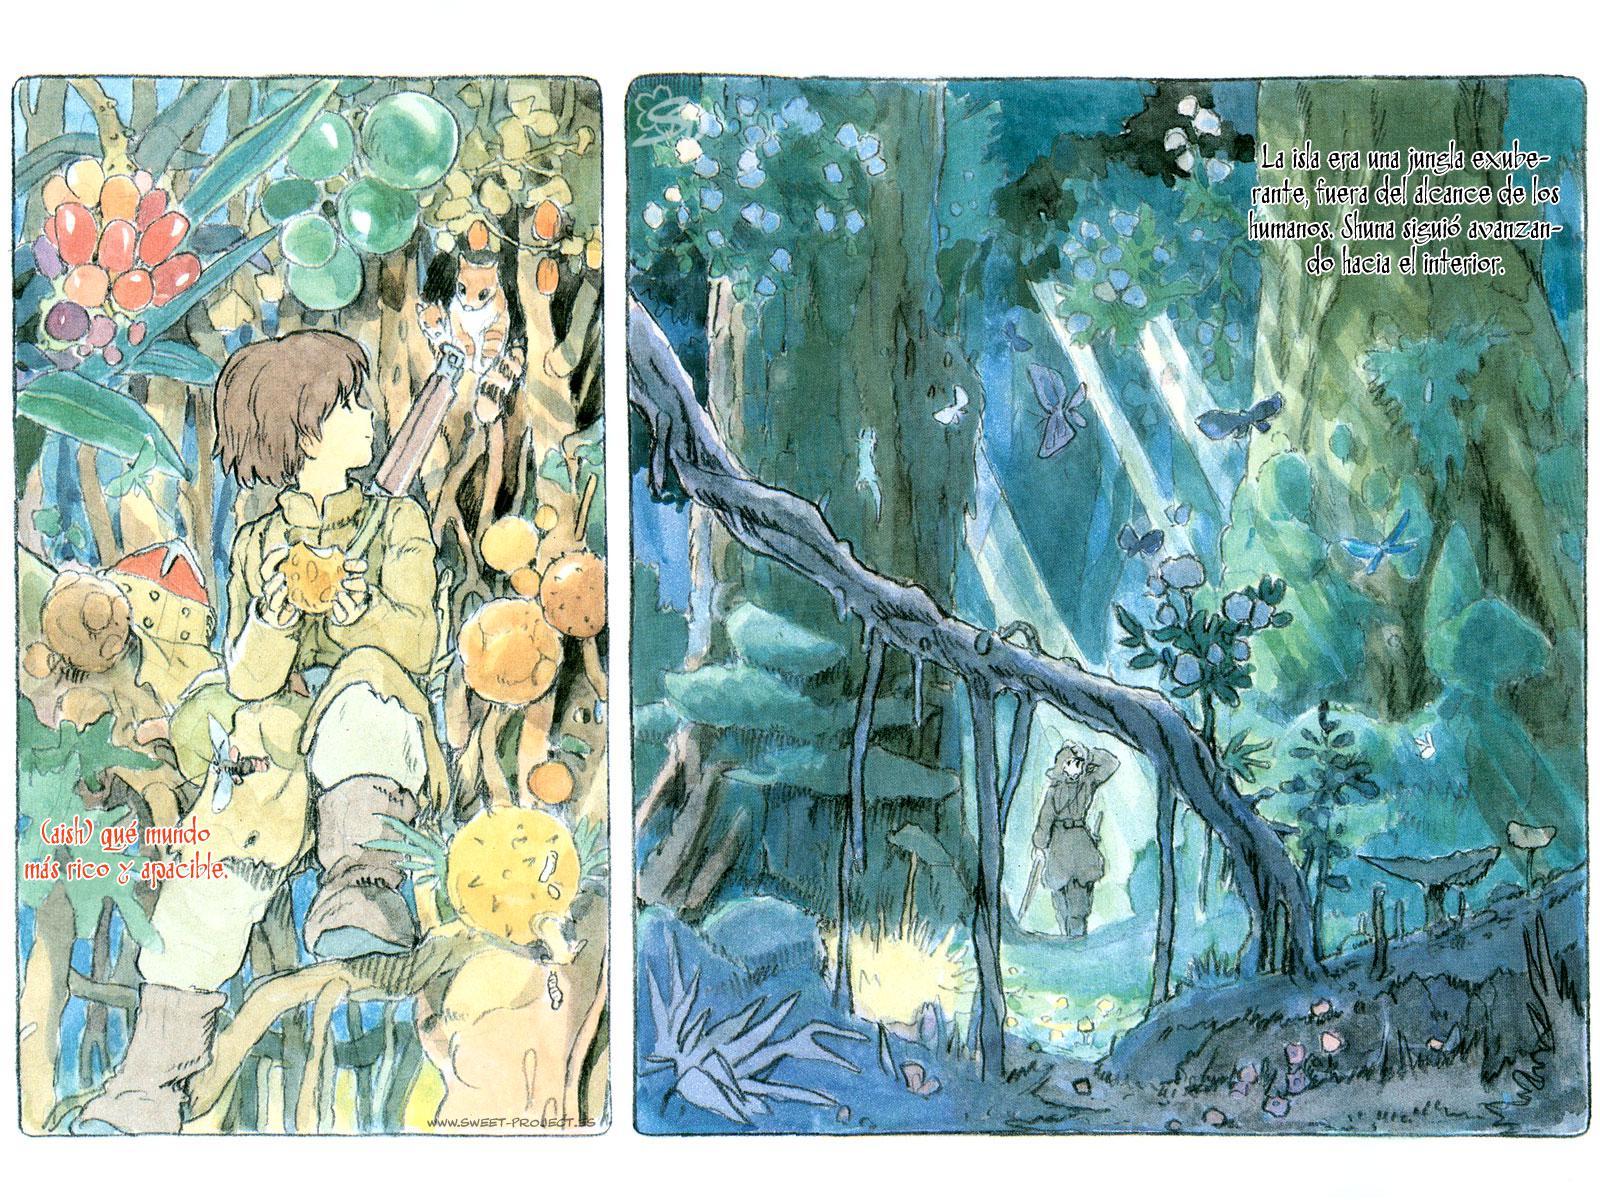 https://c5.ninemanga.com/es_manga/22/3350/429886/05daa38da5d5e11450147b8443c155e4.jpg Page 8